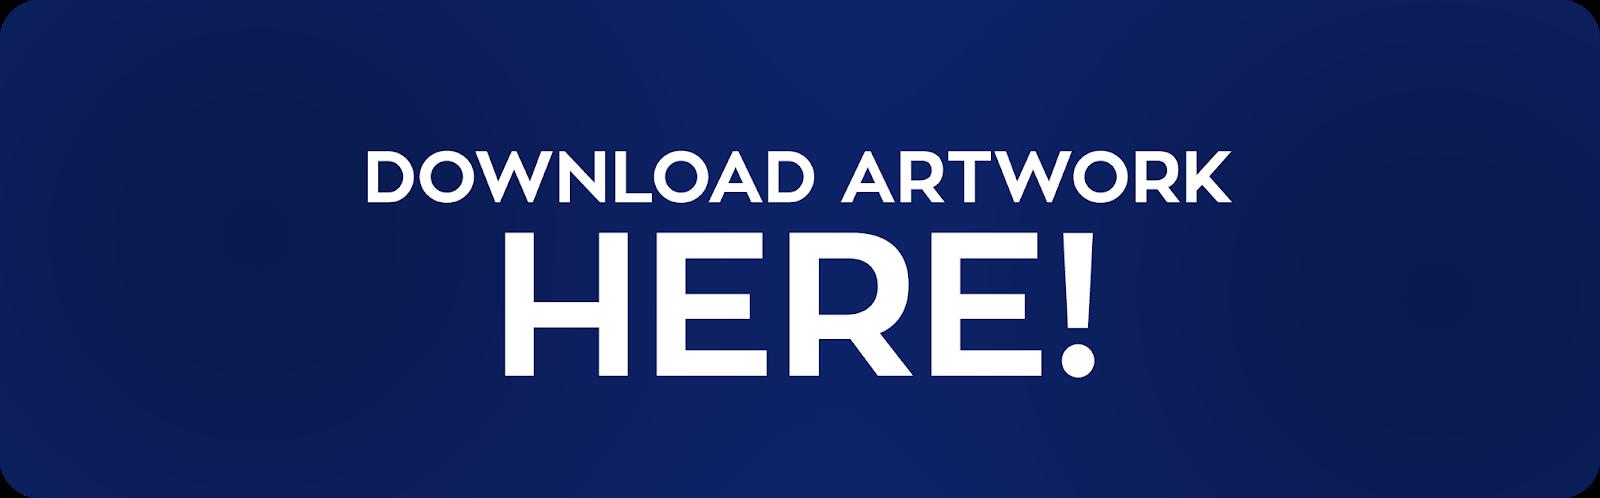 Download Artwork Here!